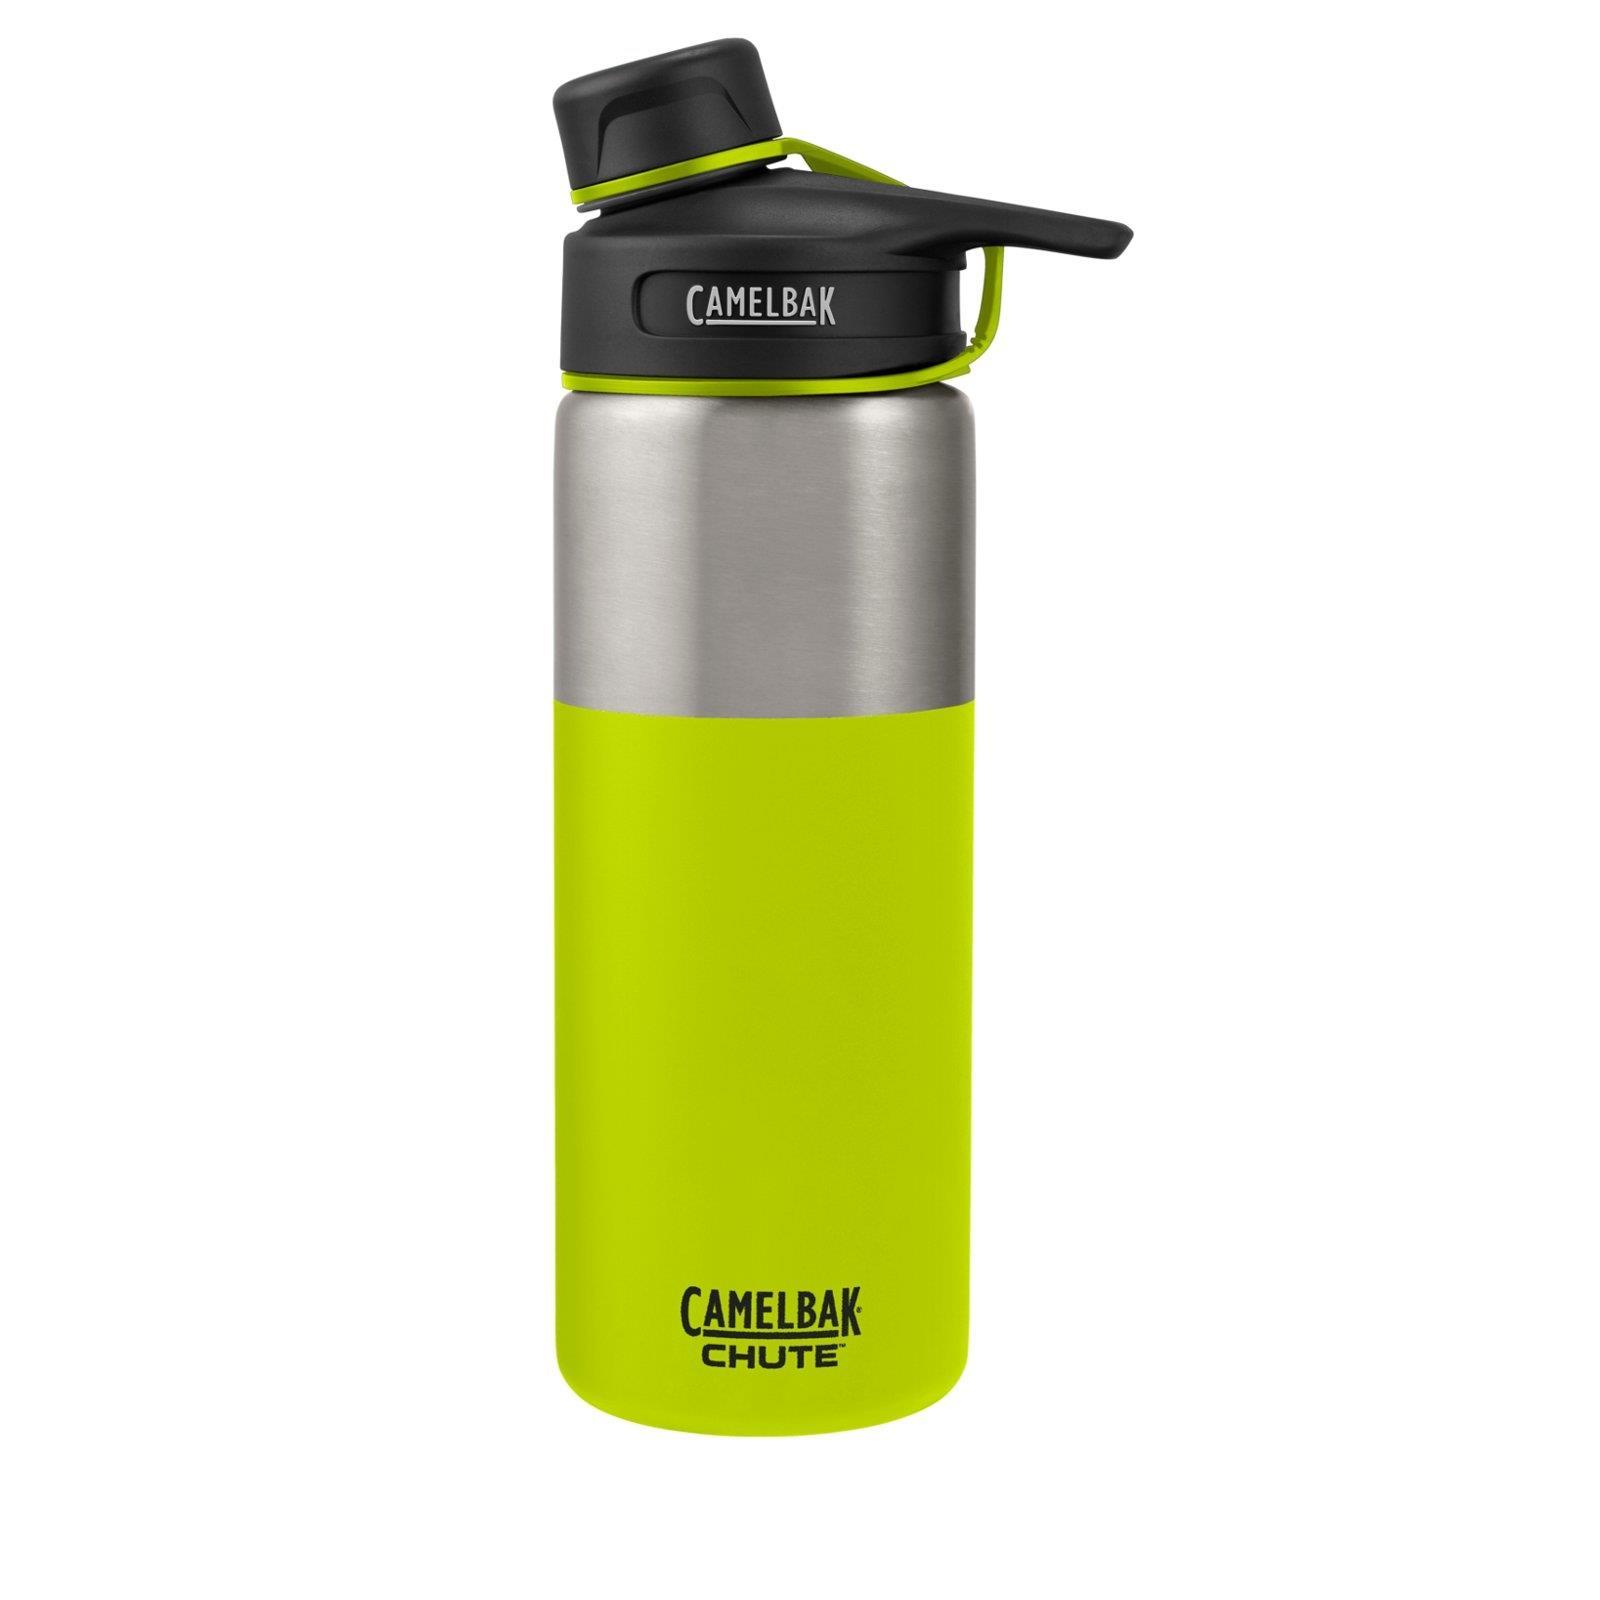 Camelbak-Trink-Isolier-Flasche-Chute-Vacuum-Thermo-Becher-Kanne-Outdoor Indexbild 22